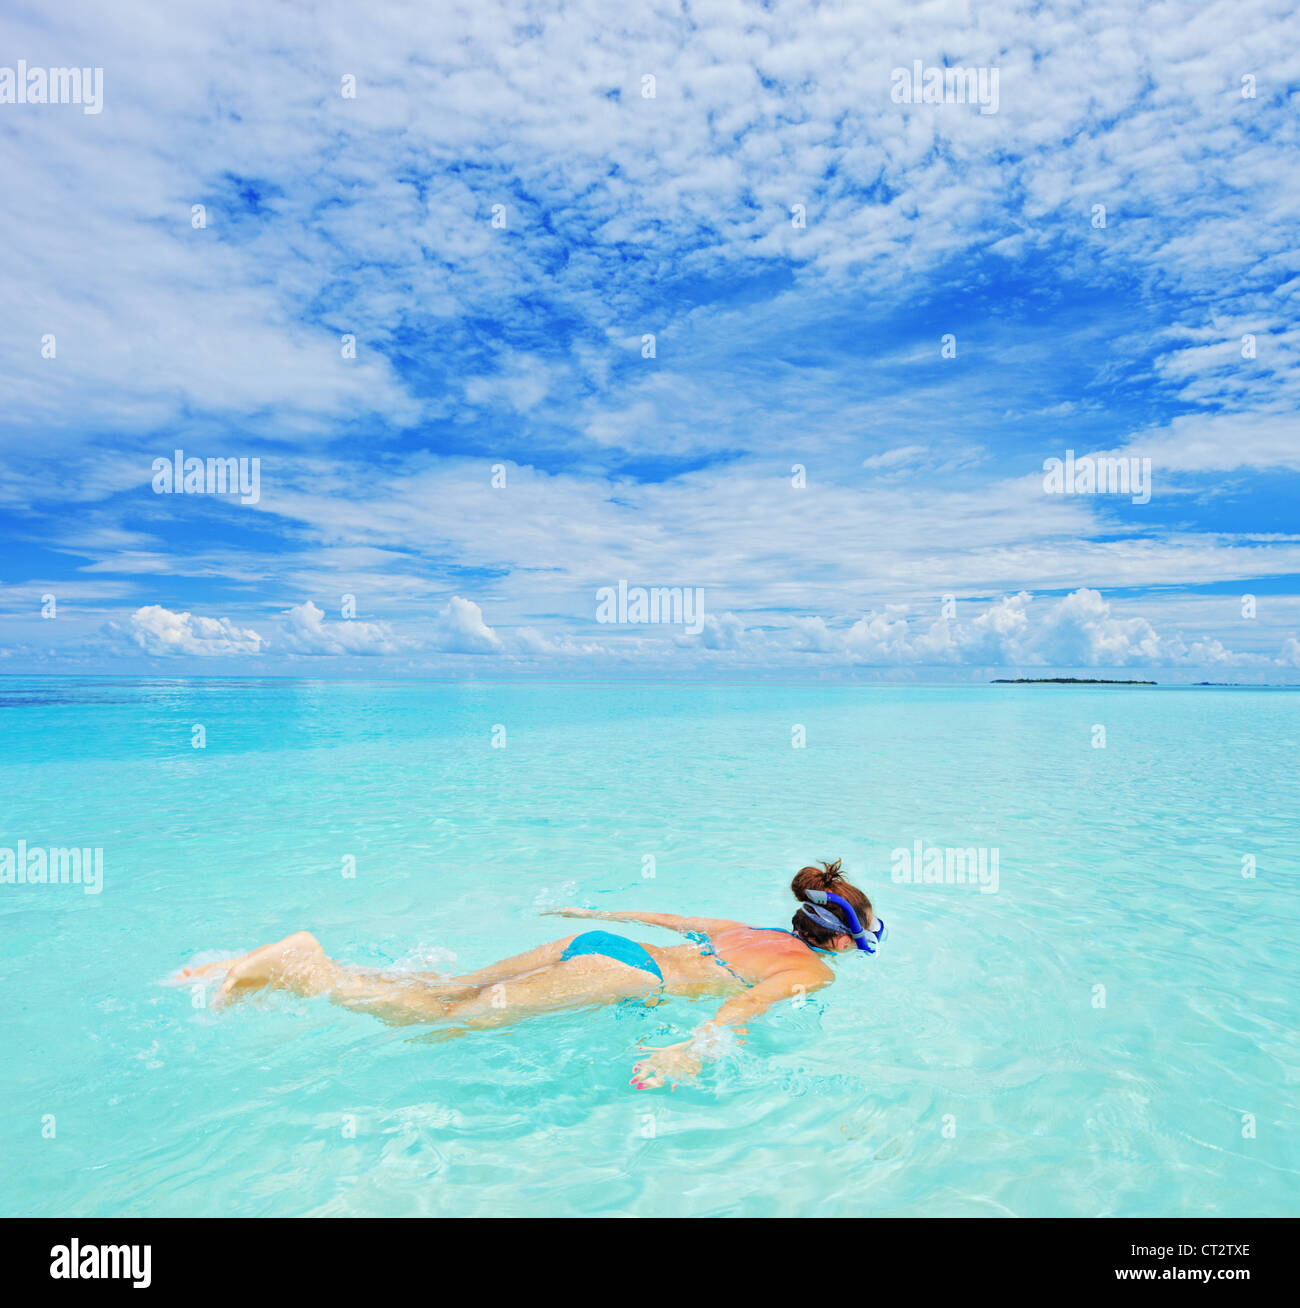 Una donna con snorkeling maschera subacquea in Kuredu resort, isole Maldive, Lhaviyani atoll Immagini Stock